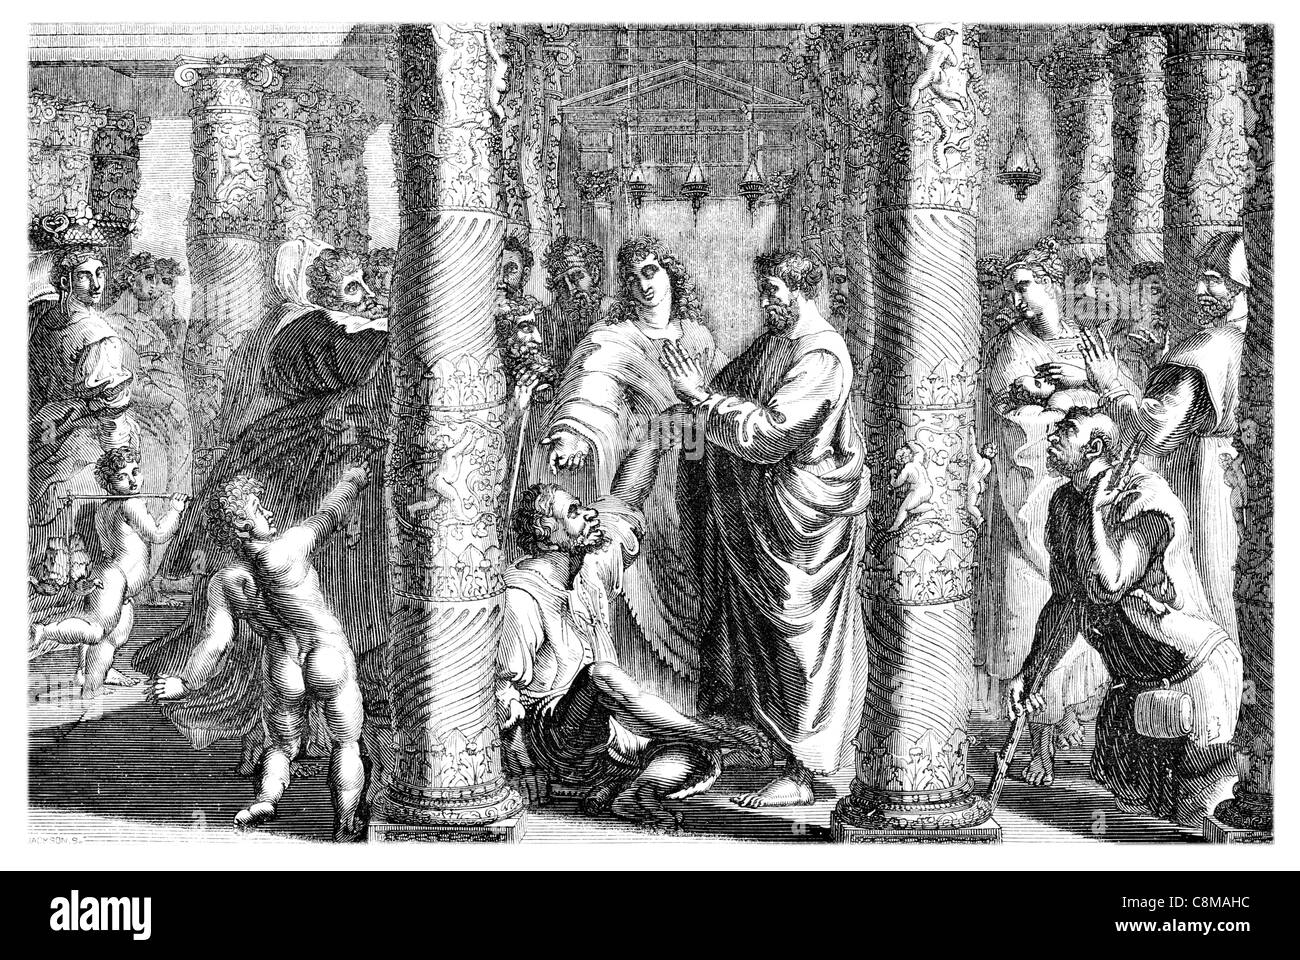 The Healing of the Lame Man Raphael Cartoons Victoria Albert Museum London High Renaissance Gospel Acts Apostle - Stock Image